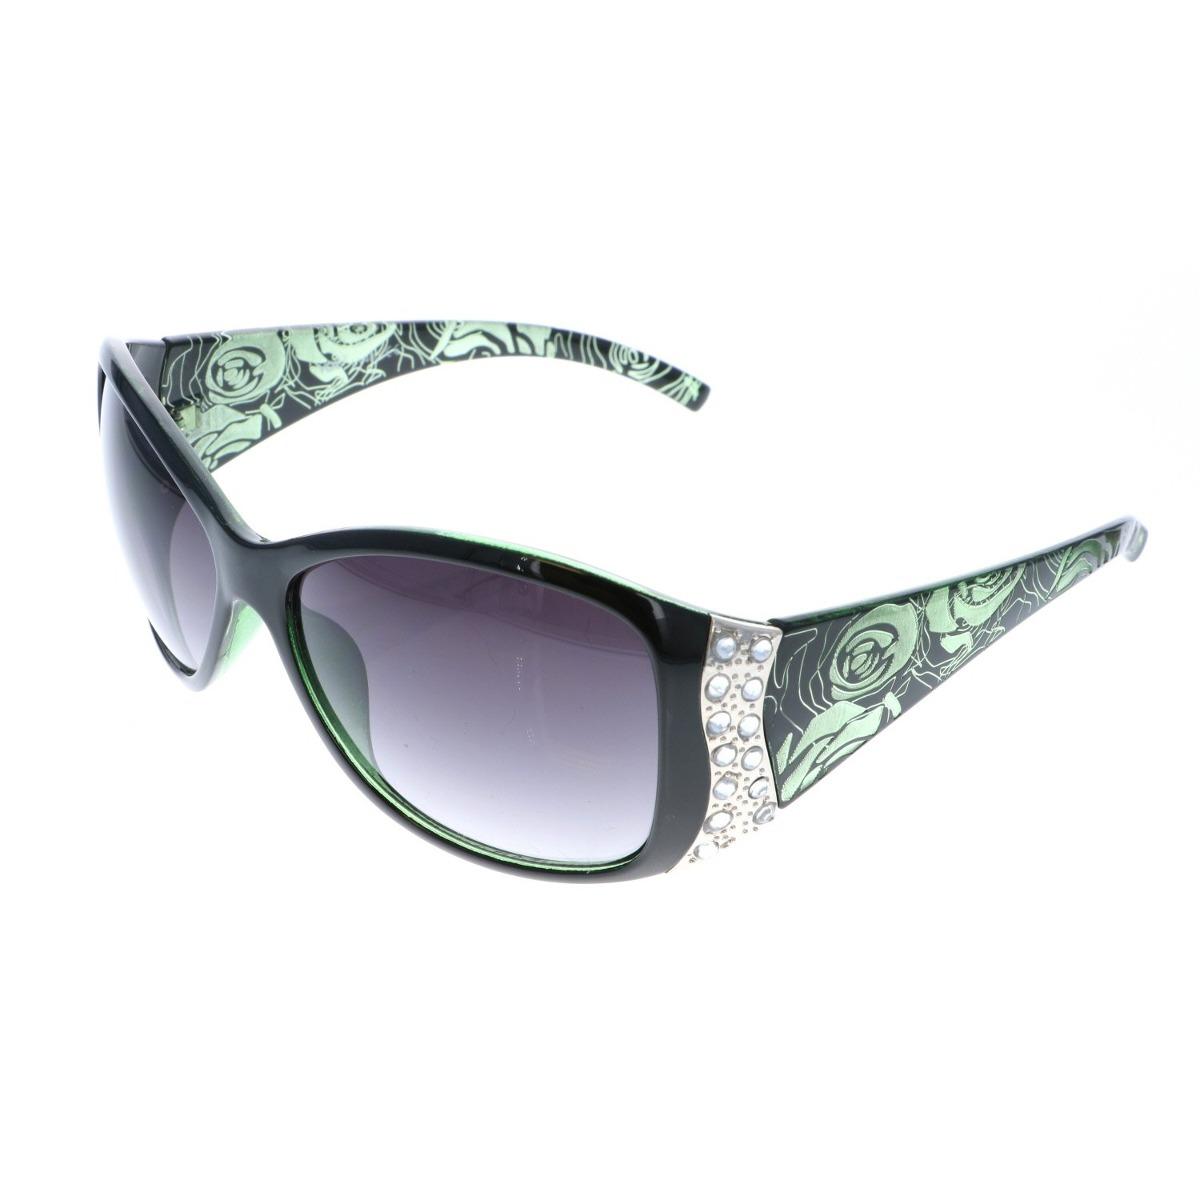 Vox Gafas De Sol Para Mujer Diseñador Sport Fashion Rhinest ... 20710636af09